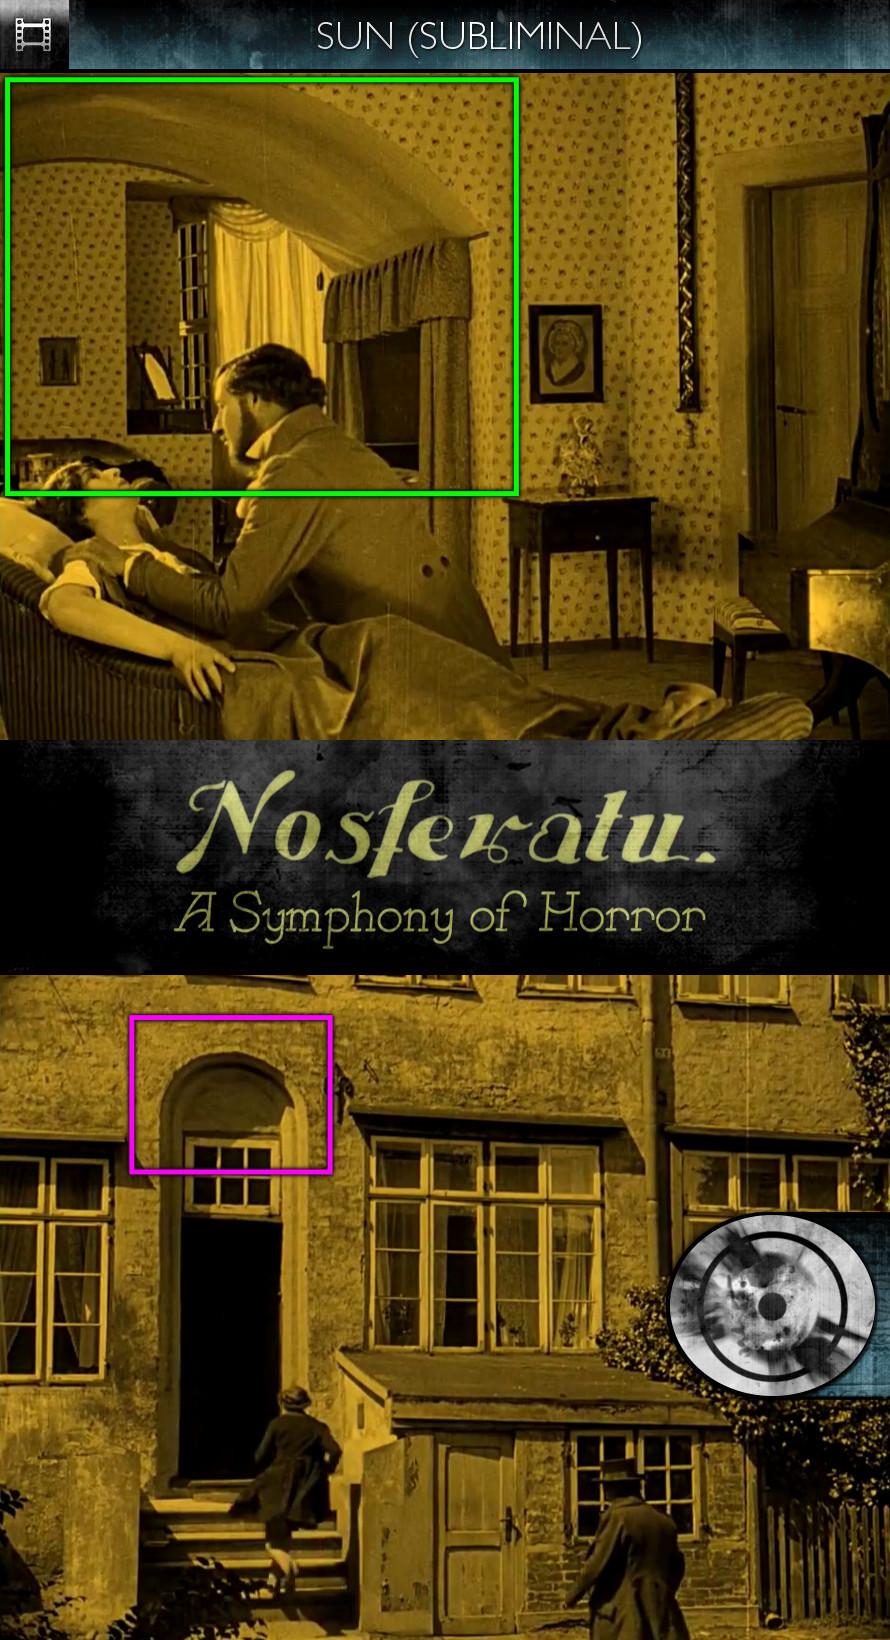 Nosferatu - A Symphony of Horror (1922) - Sun/Solar - Subliminal